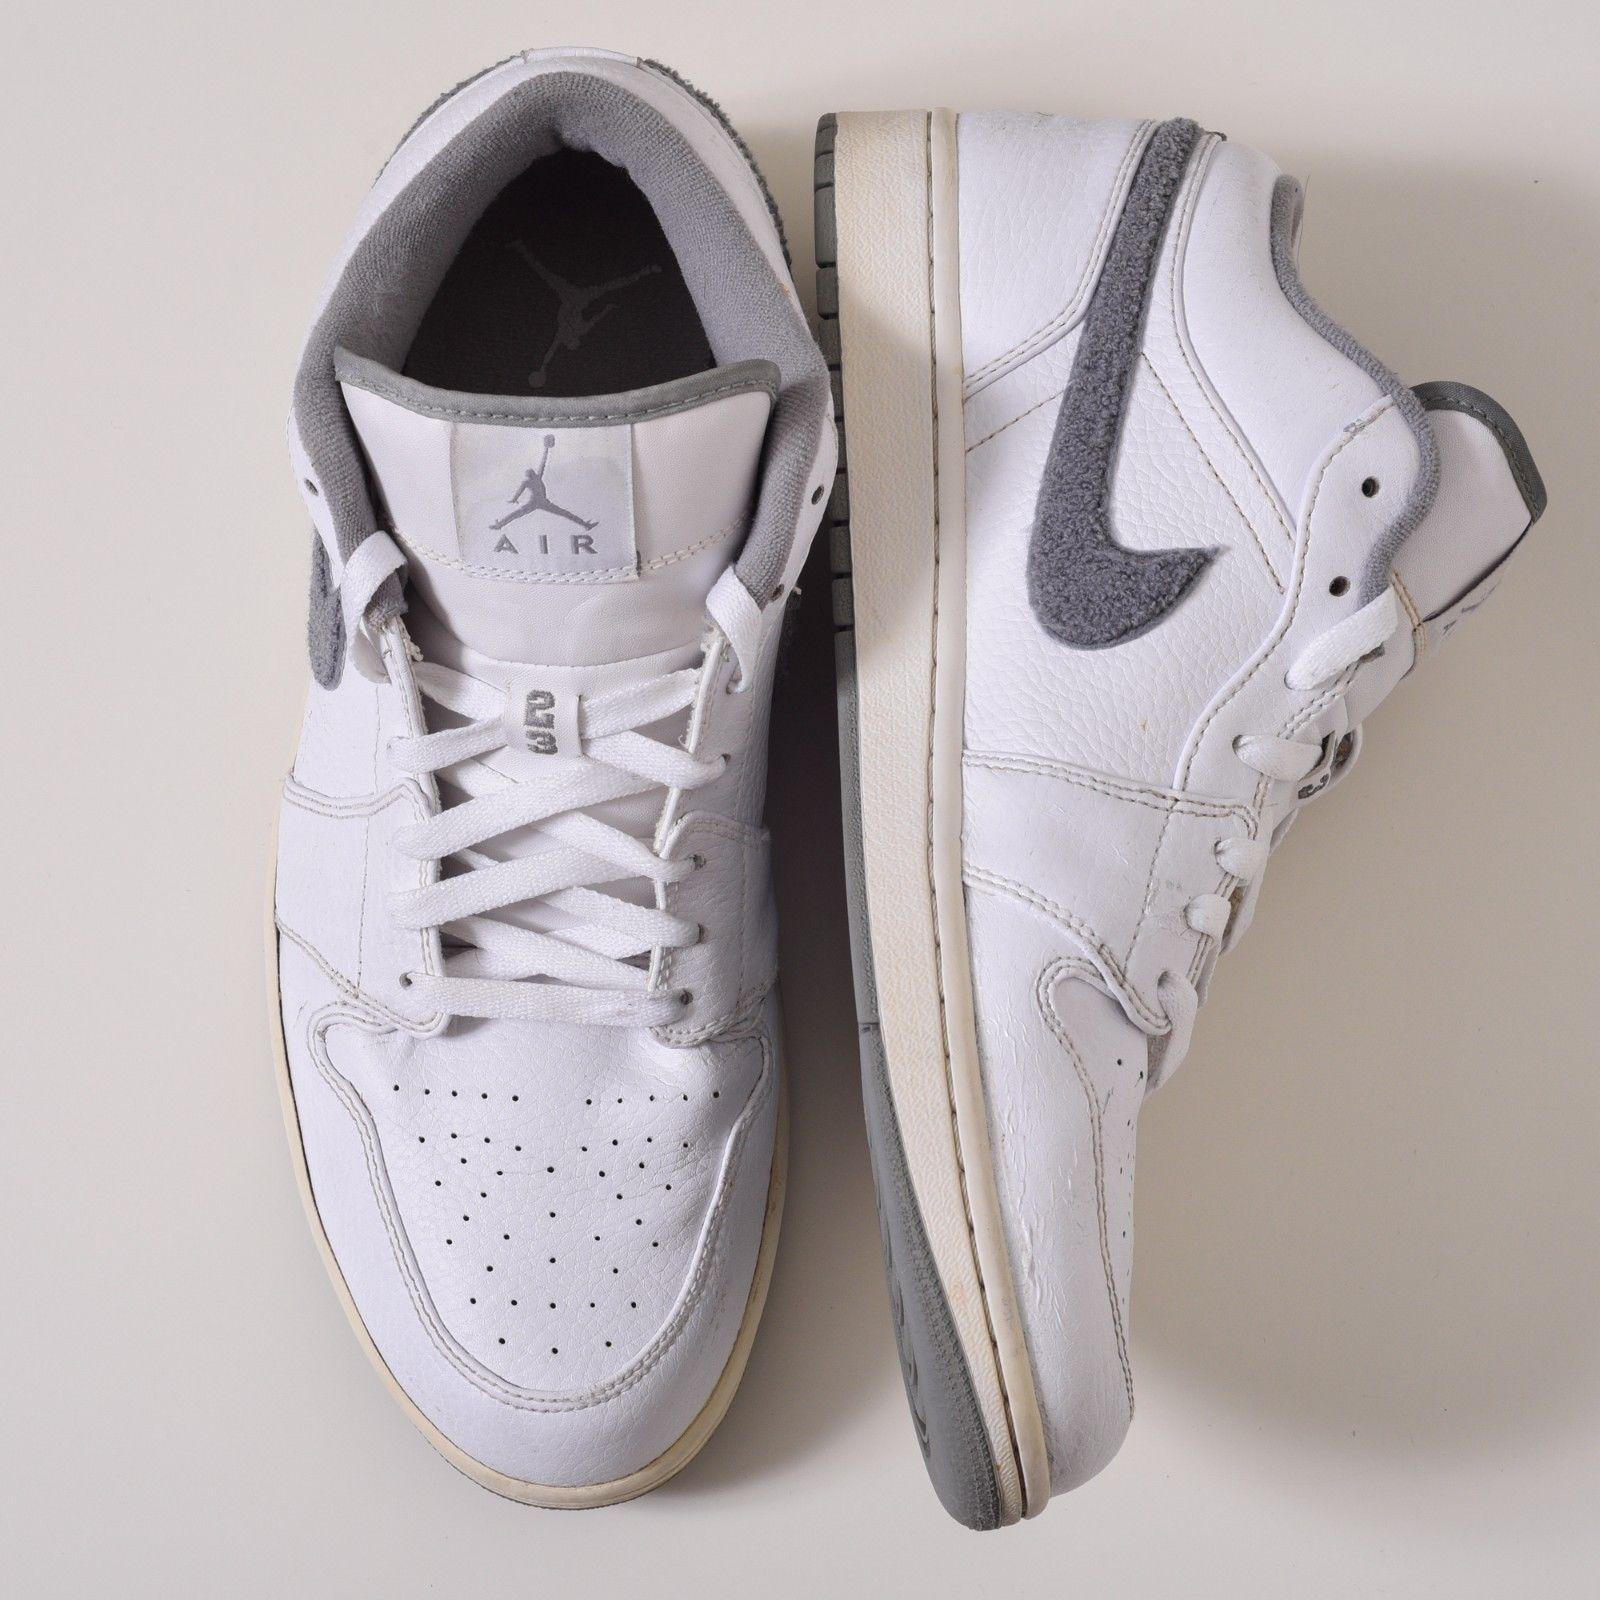 best website b0a7f 52435 Nike Air Jordan 1 Phat Low 338145-008 Mens Sneakers Cool Grey White Size 12